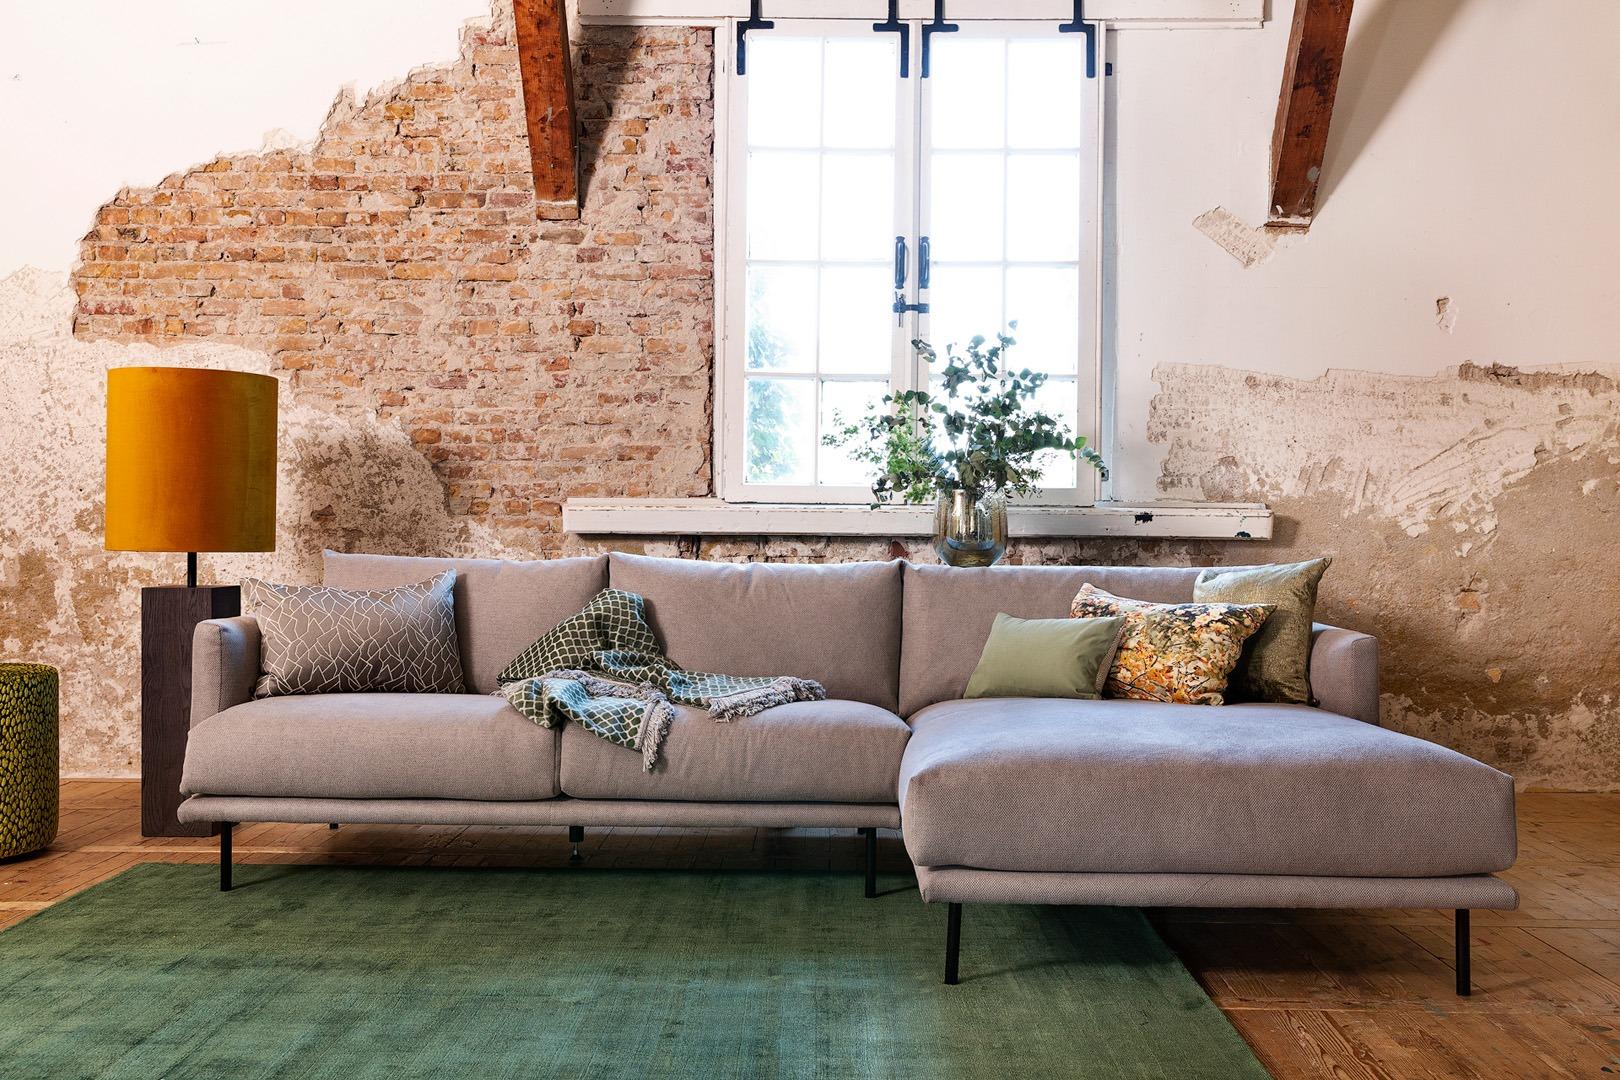 new-yorker-hoekbank-longchair-grijs-stof-soofs-interieur-1- (1)